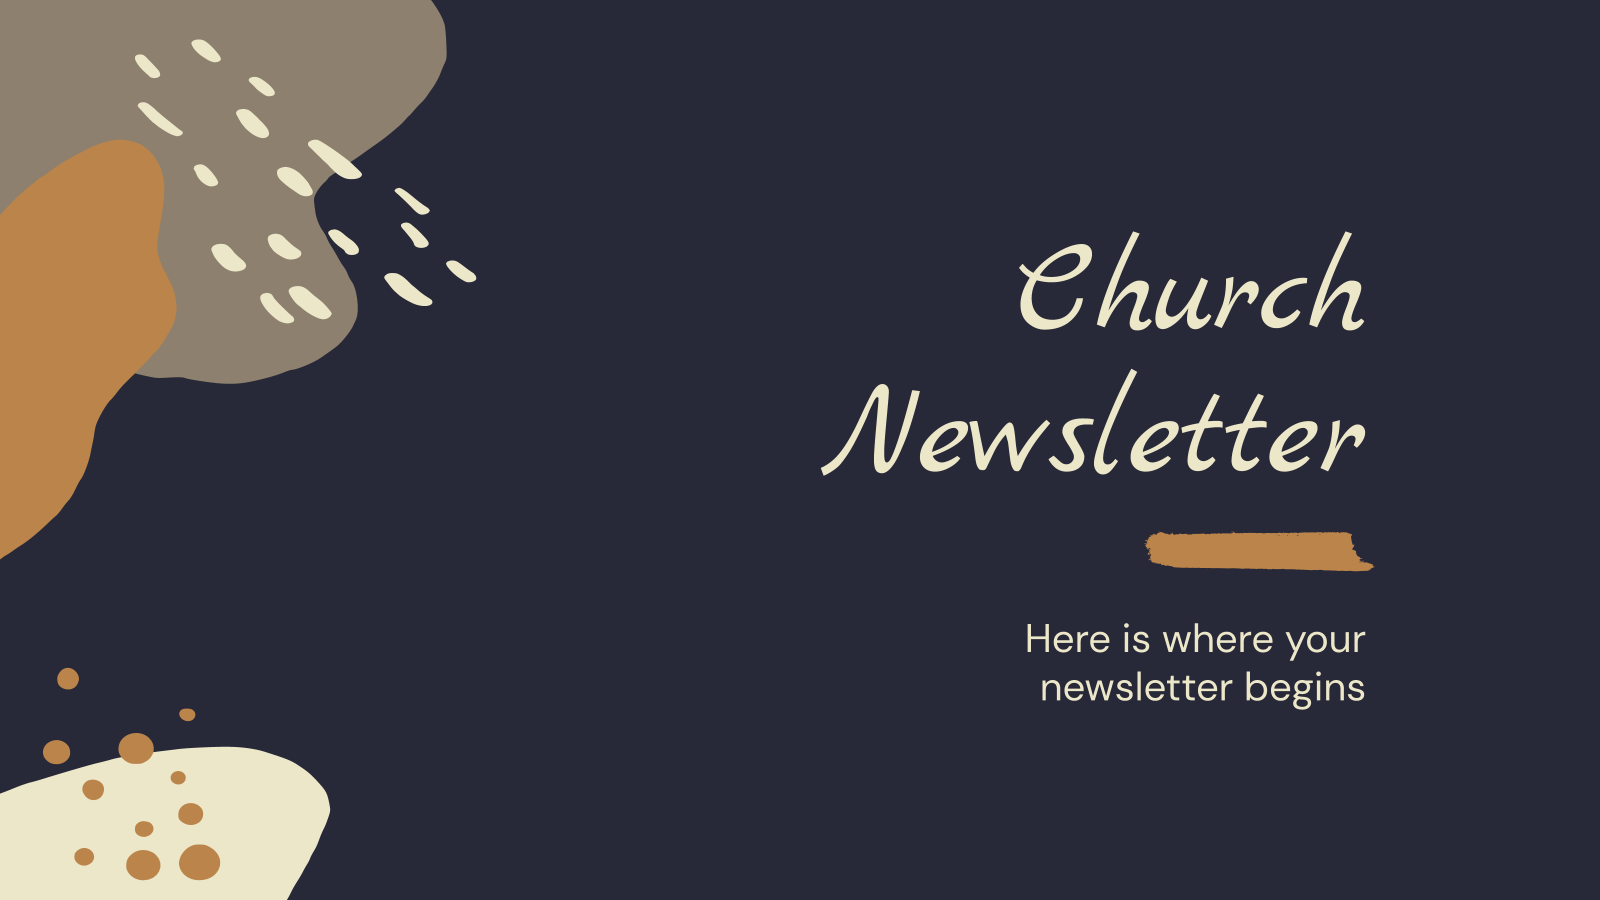 Church Newsletter presentation template